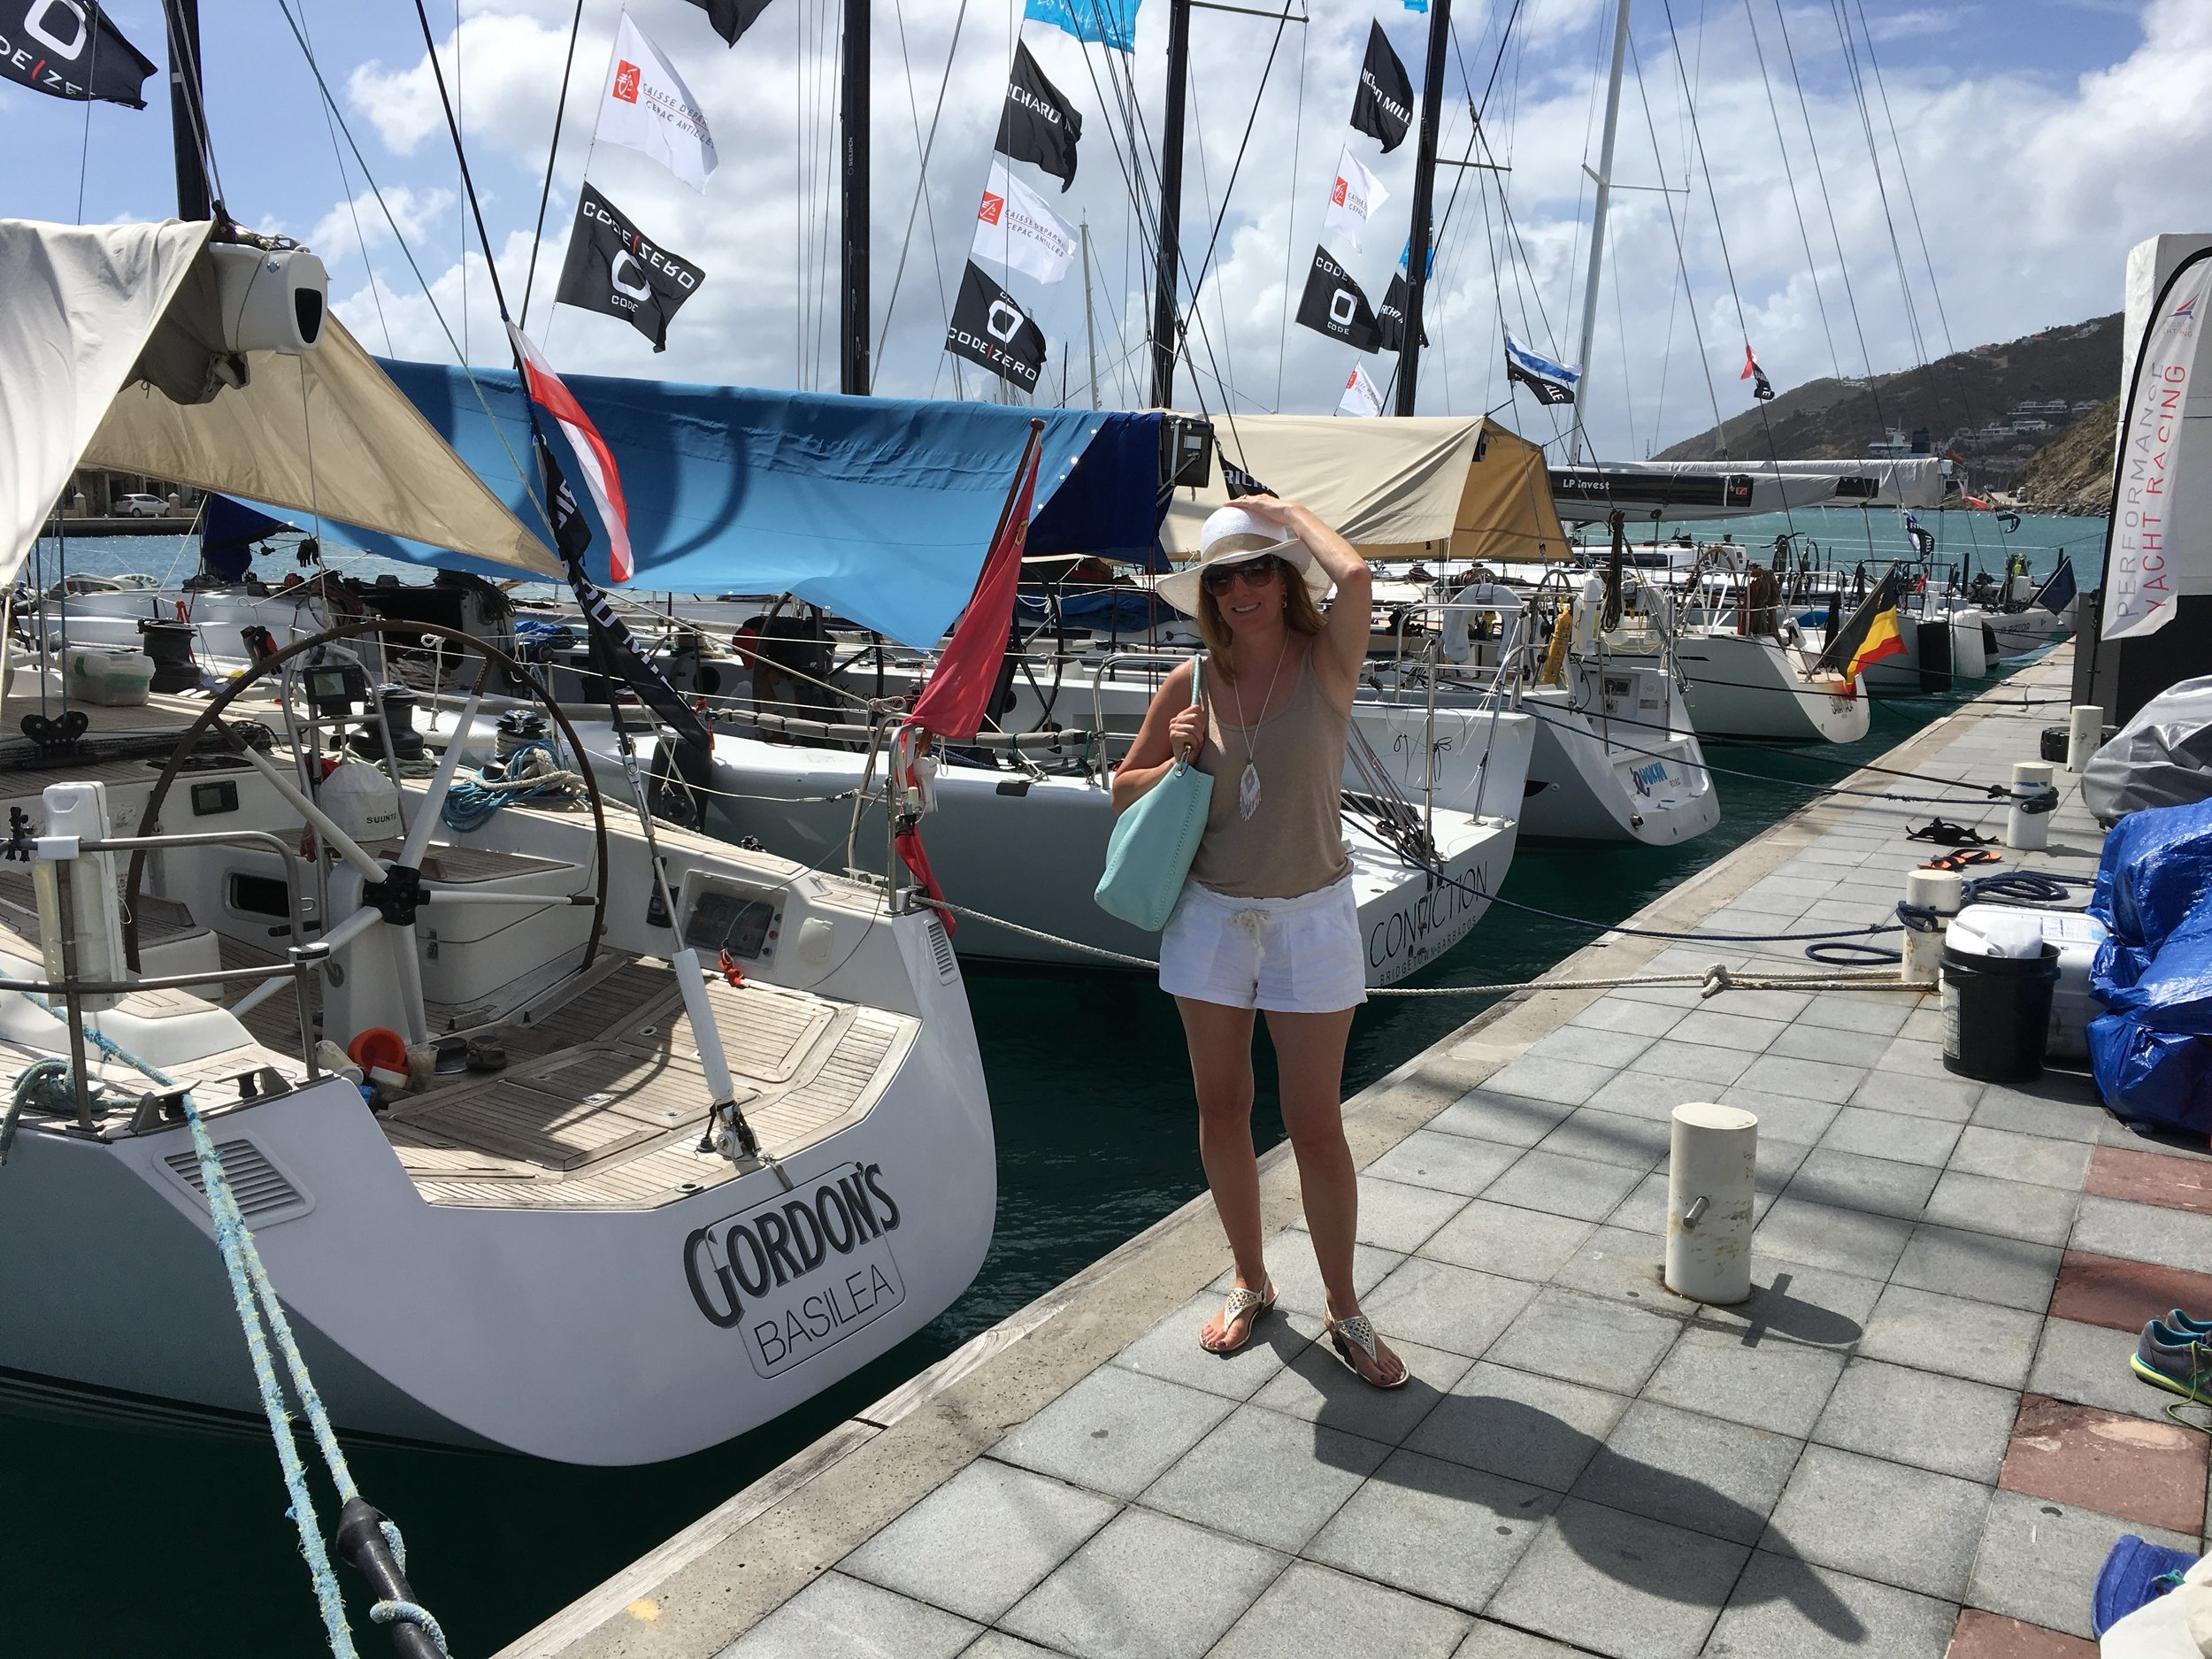 voiles-sailboat-race-st-bart.jpg